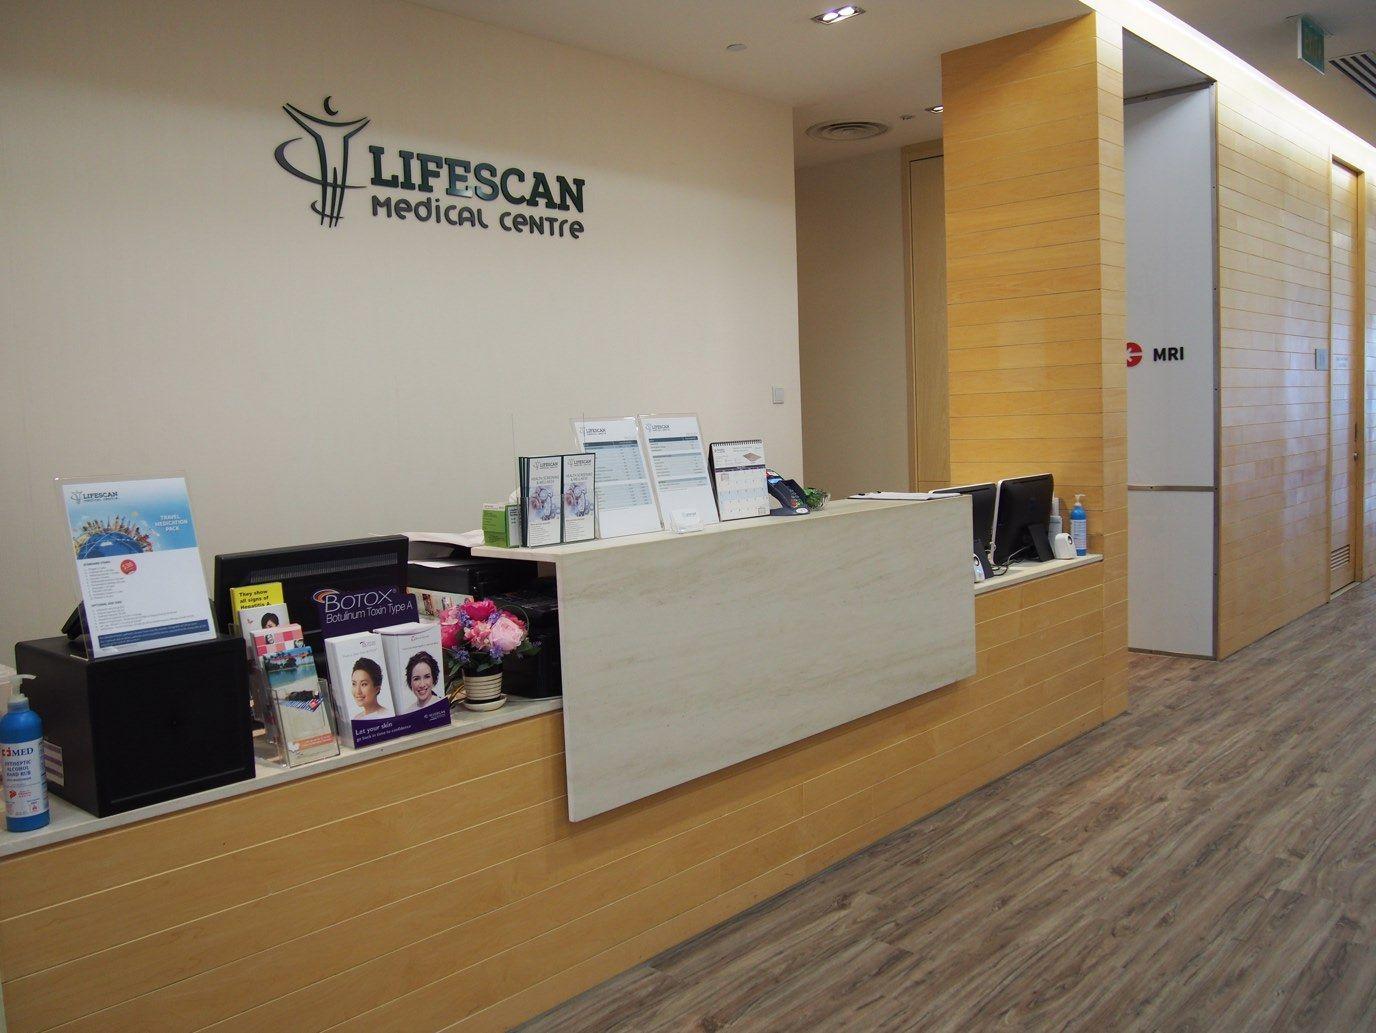 Lifescan Medical Centre & Lifescan Imaging - Paragon Medical